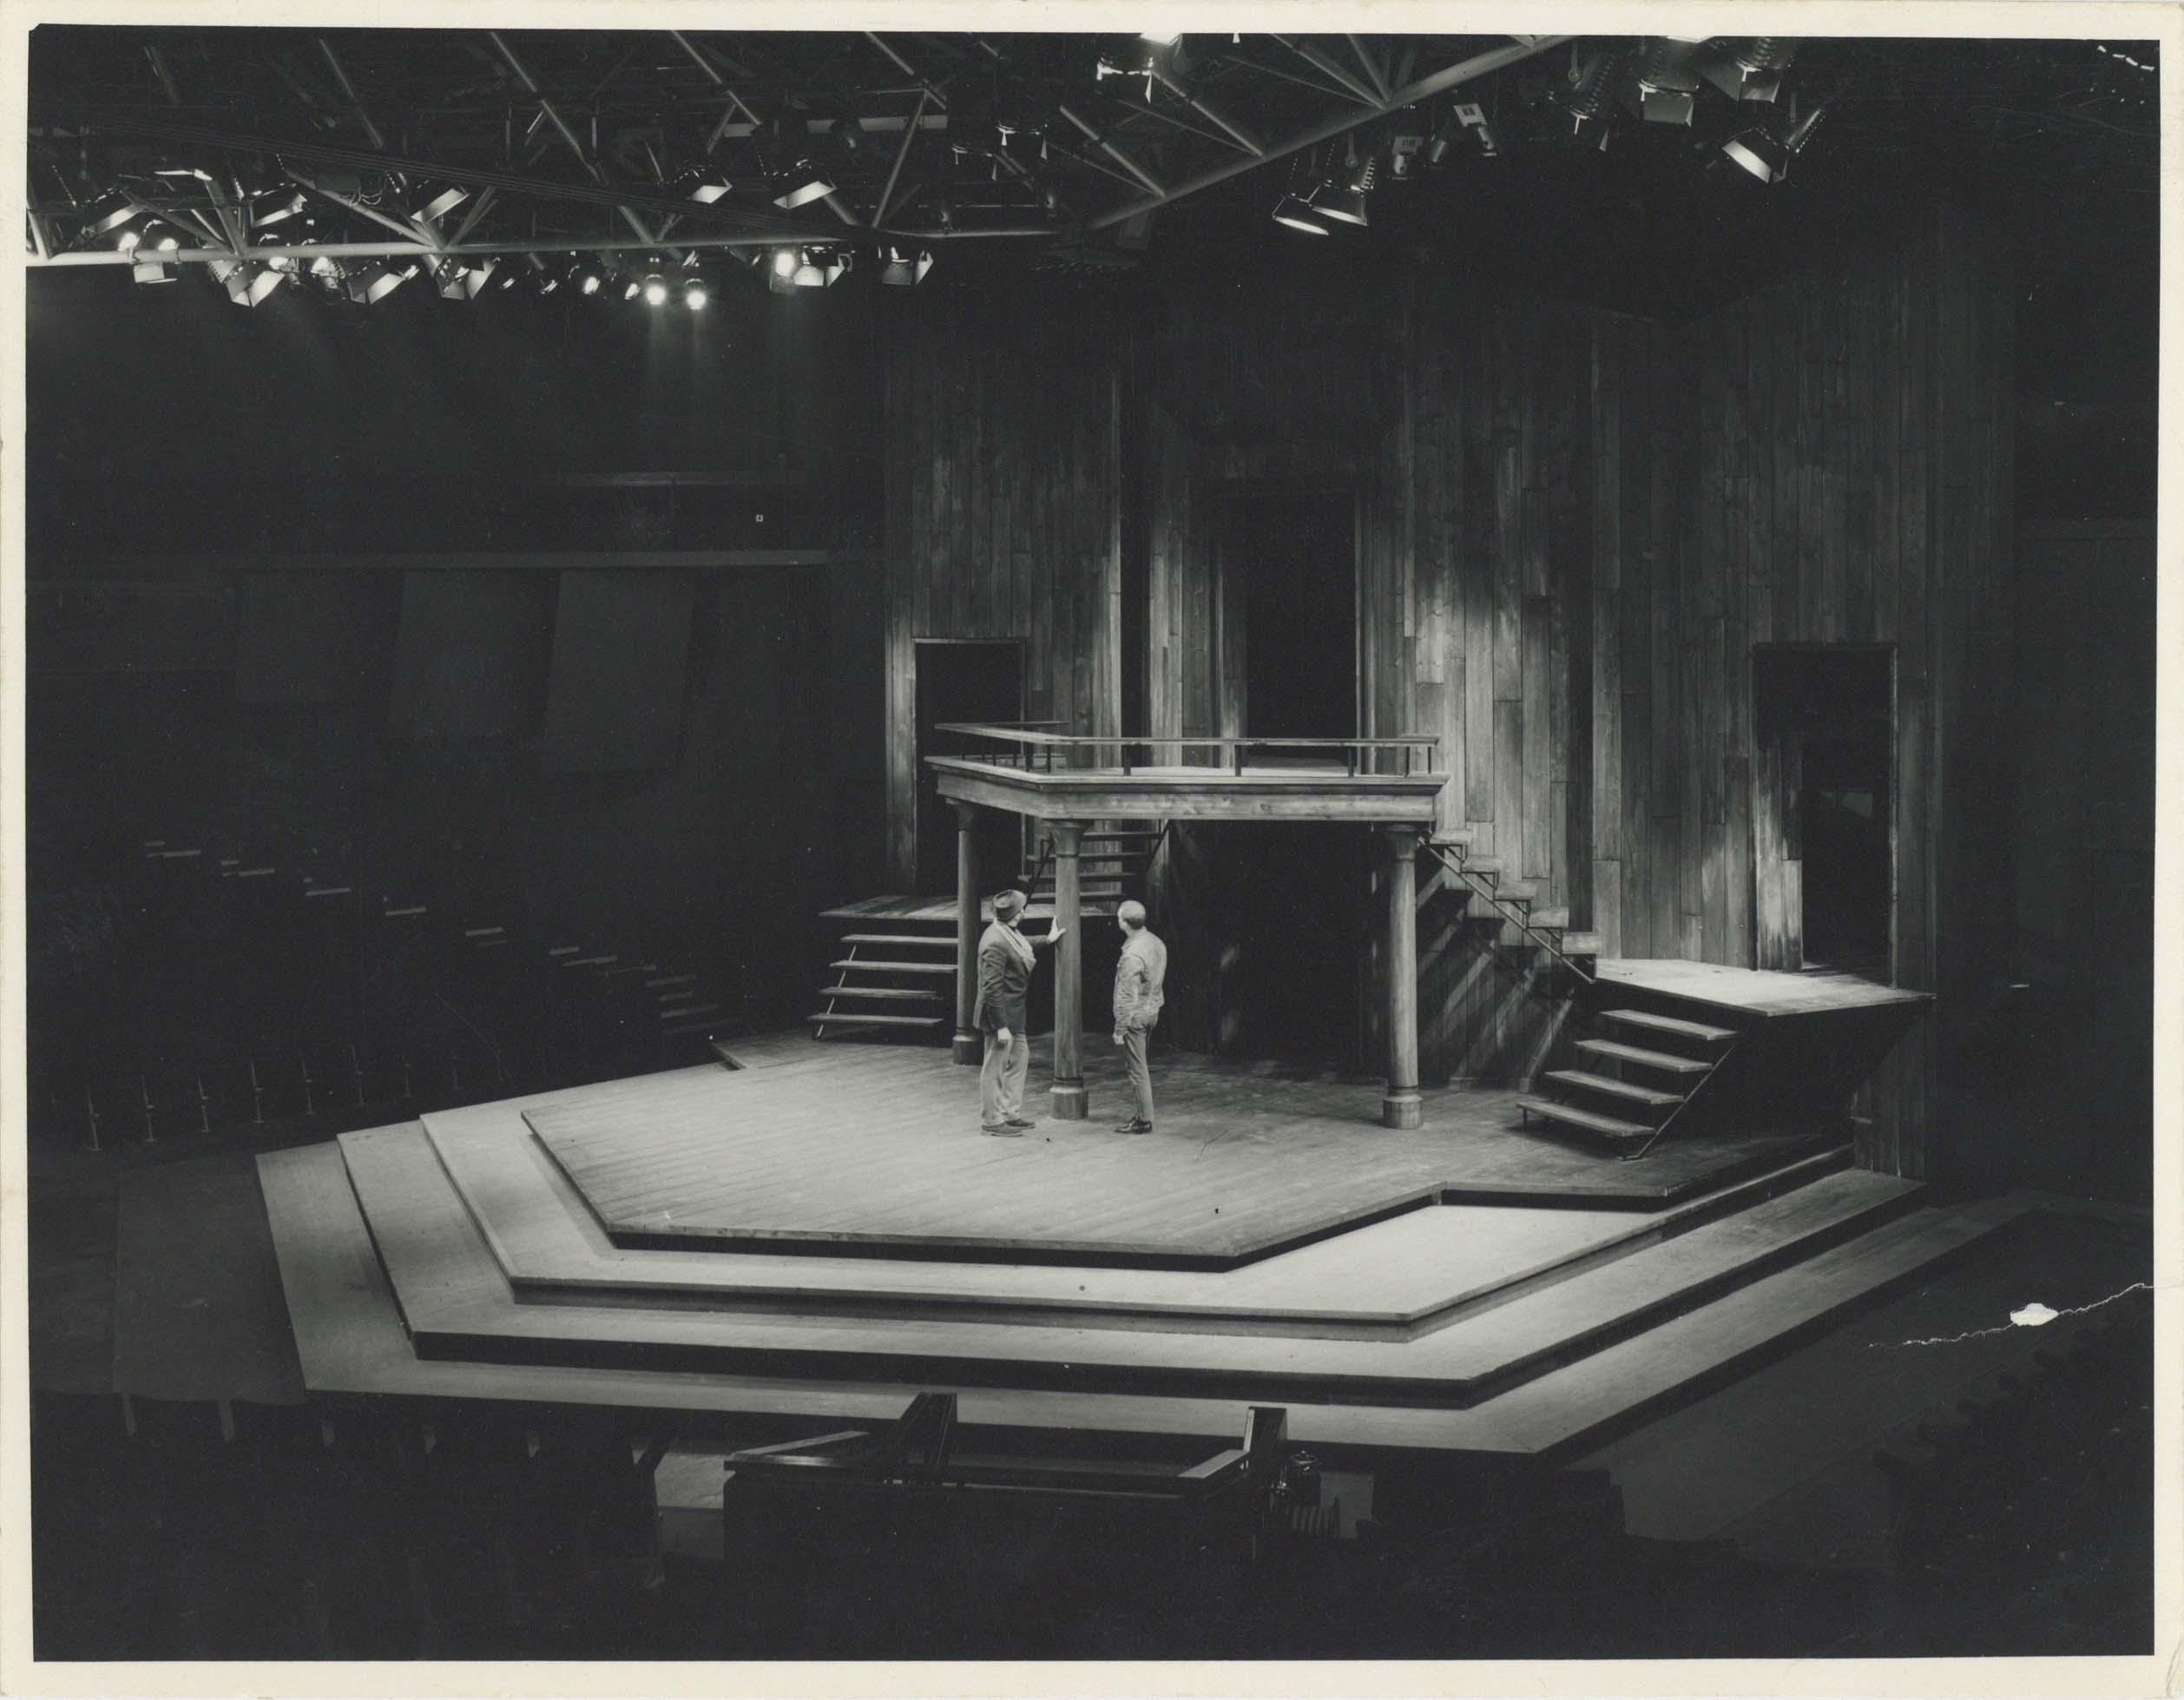 Photograph Interior Auditorium - Photographer unknown - Date unknown - Box 71 CFT WSRO - H21xW16